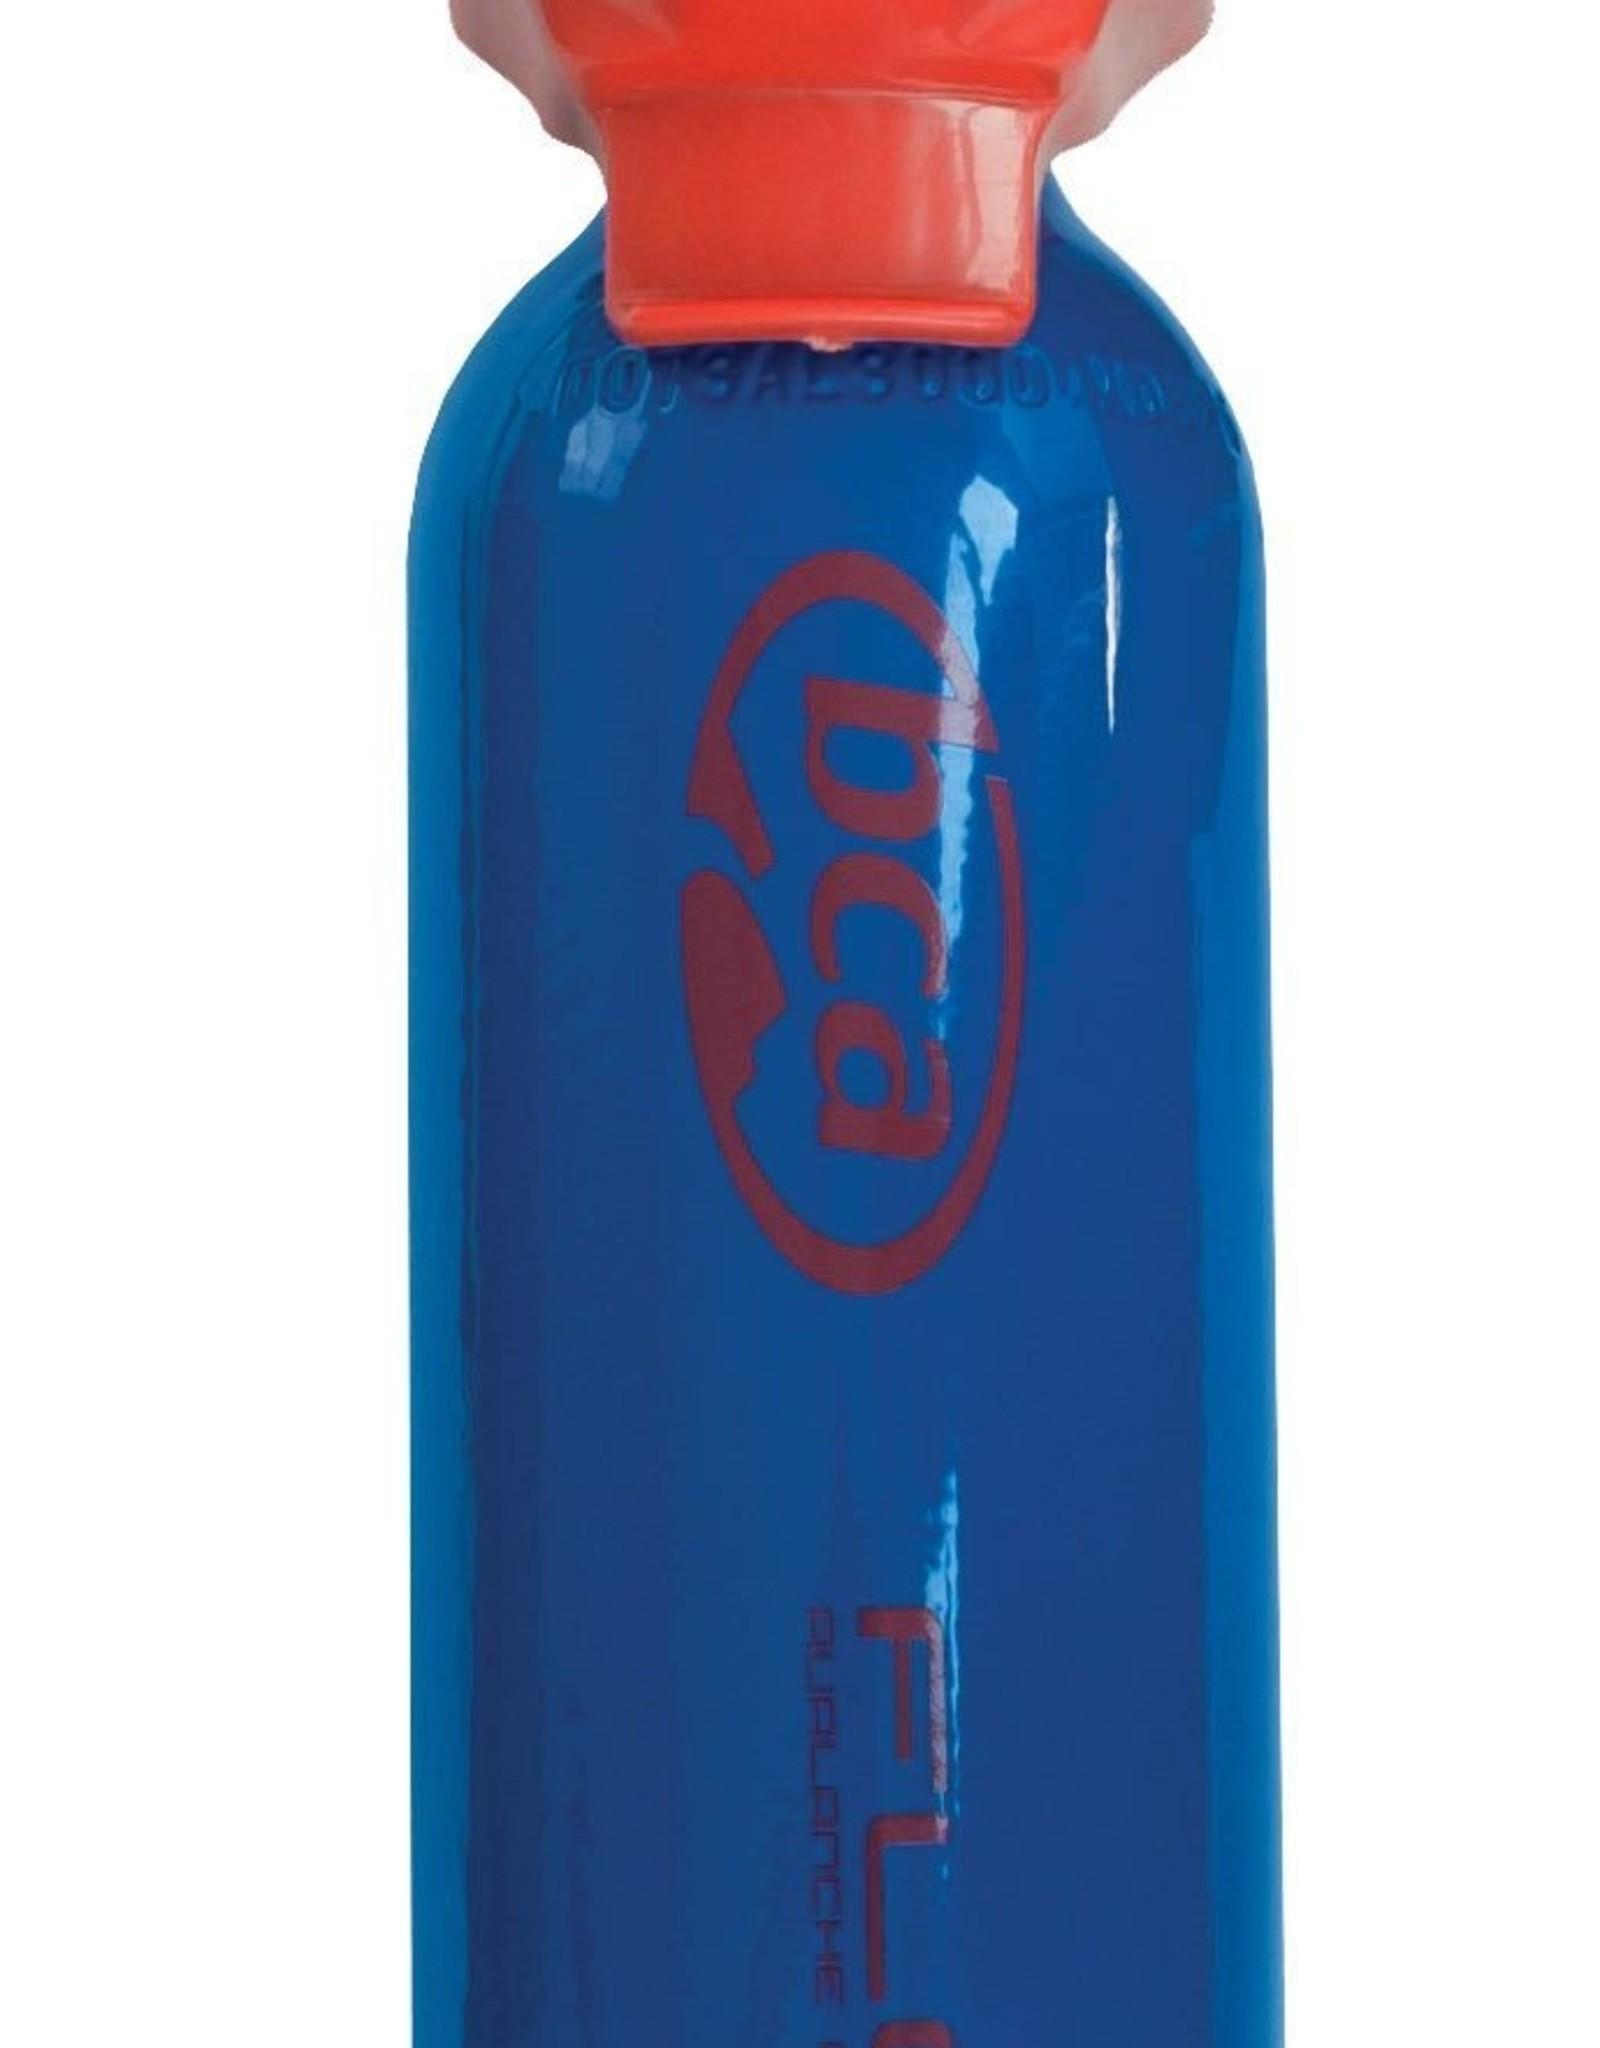 BCA Float 2.0 Cylinder Full -W2020